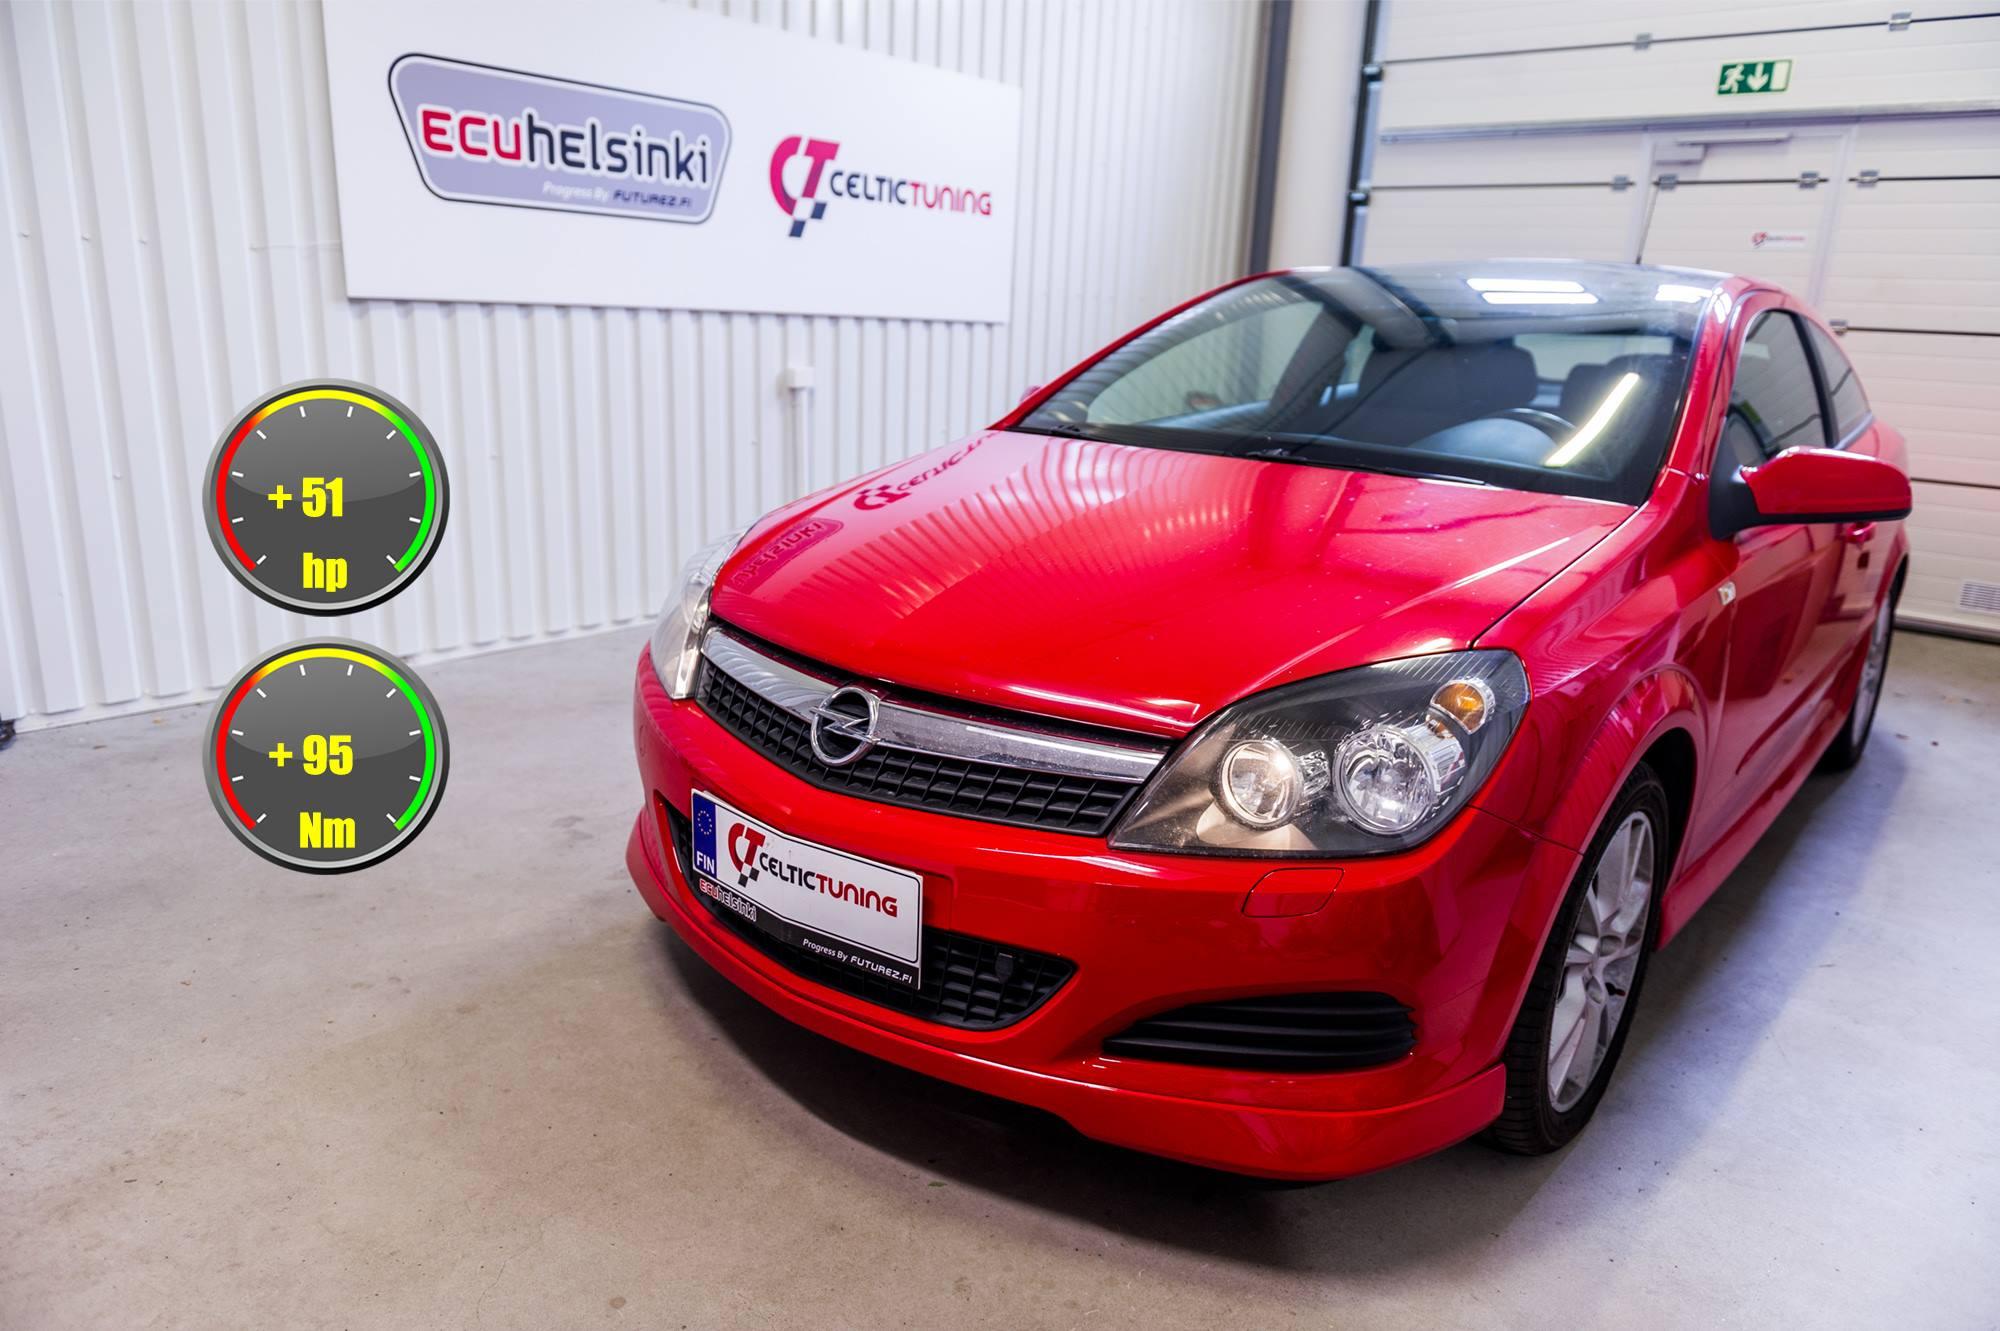 Opel Astra GTC 1.6 turbo lastutus